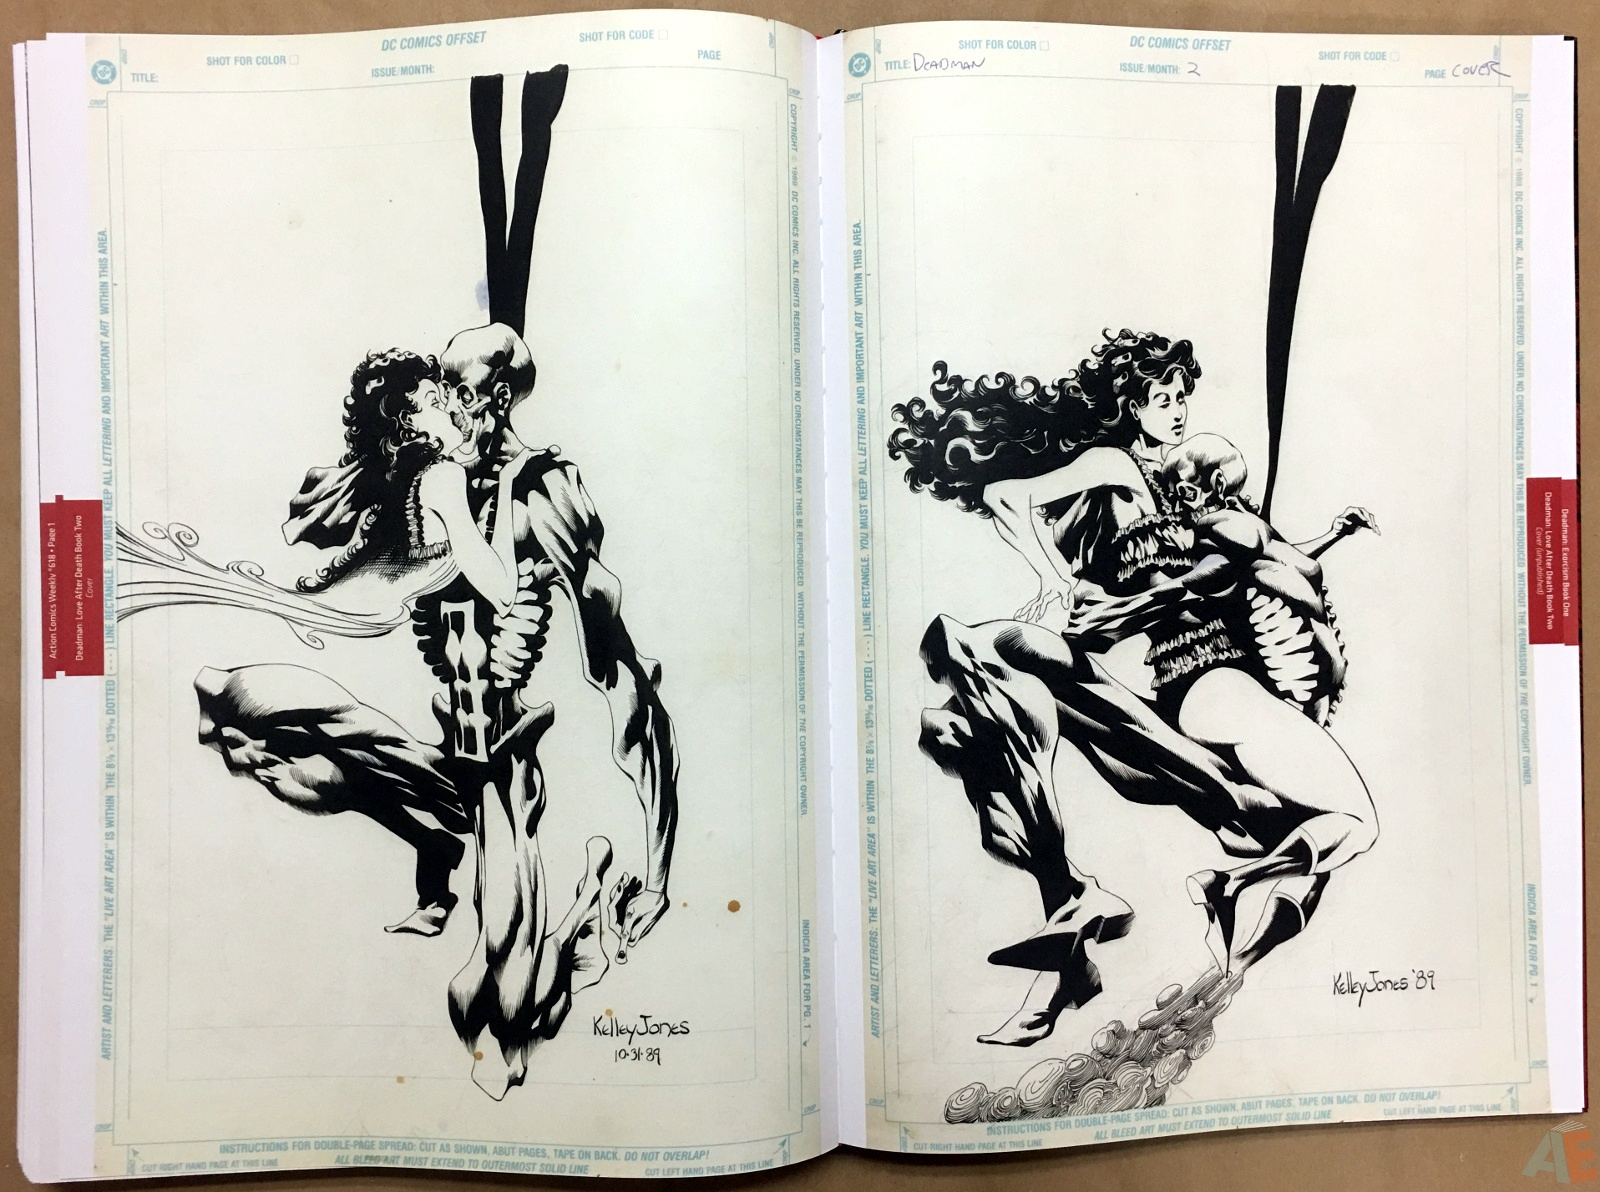 Deadman: Kelley Jones Gallery Edition 54